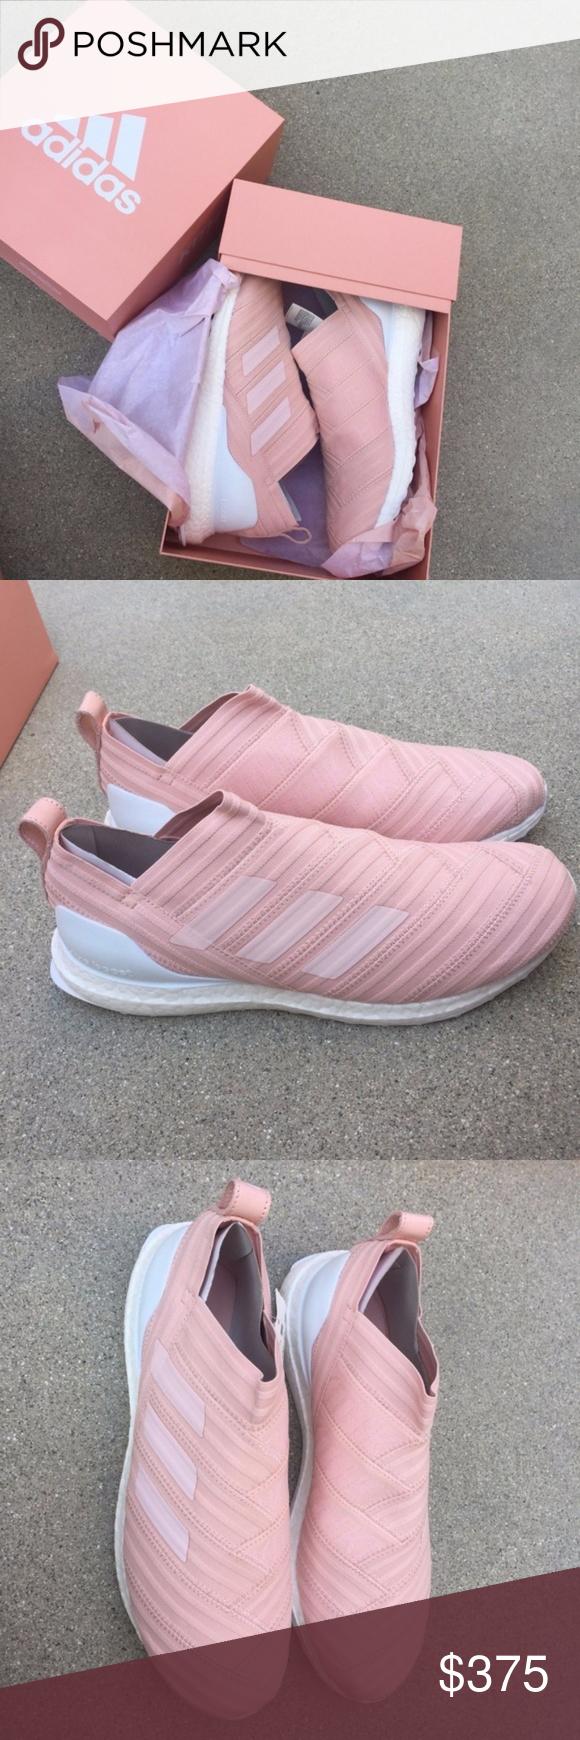 pretty nice 67cf4 4c16b NIB Kith X Adidas Nemeziz Ultraboost 17+ Flamingos NIB Kith X Adidas  Authentic Soccer Nemeziz 17 Ultraboost 17+ Flamingos Size 10.5 New with box  Super Rare. ...